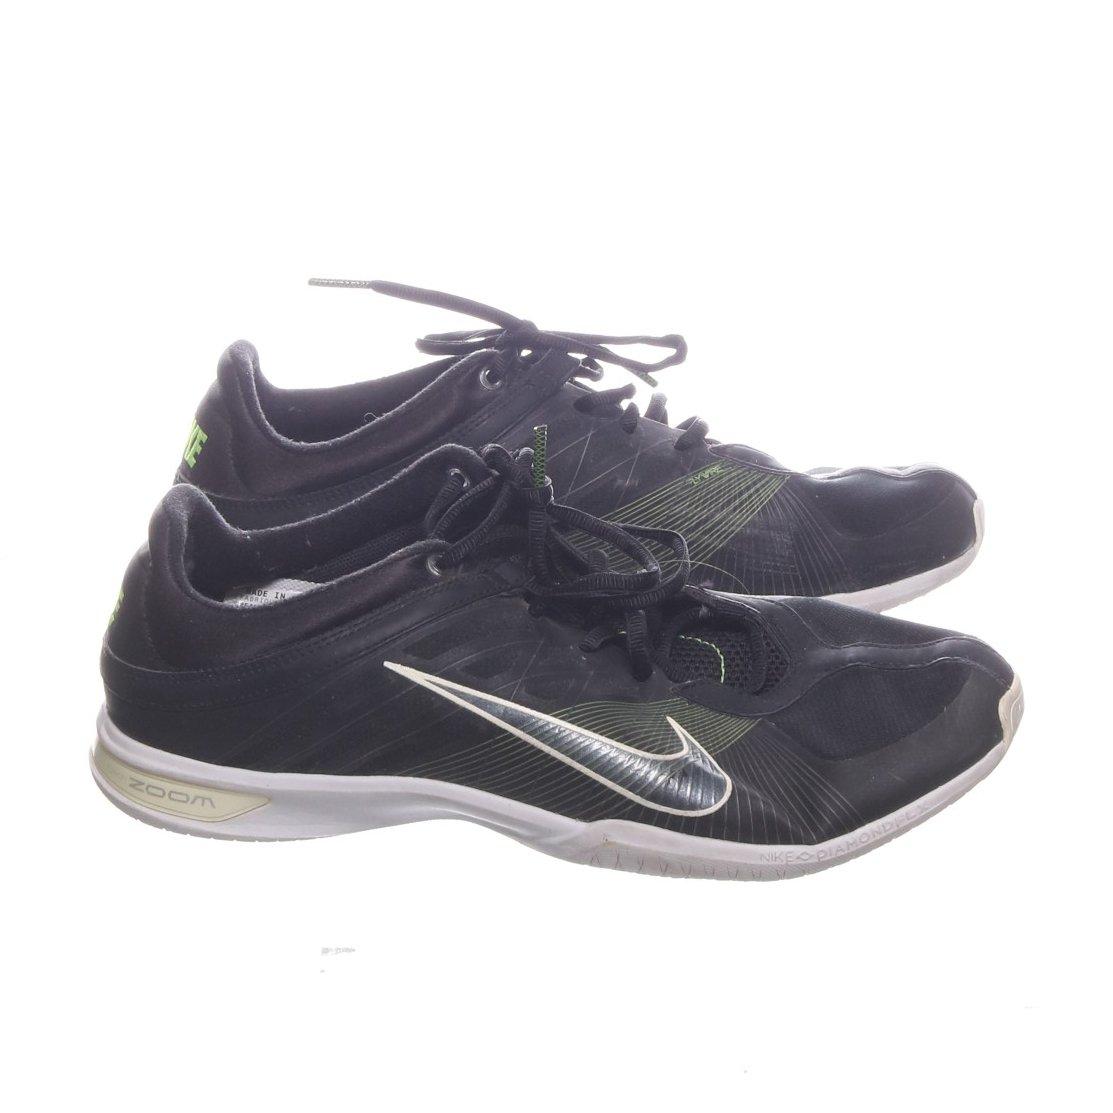 Nike, Tr?ningsskor, Strl: 40, Zoom, Svart